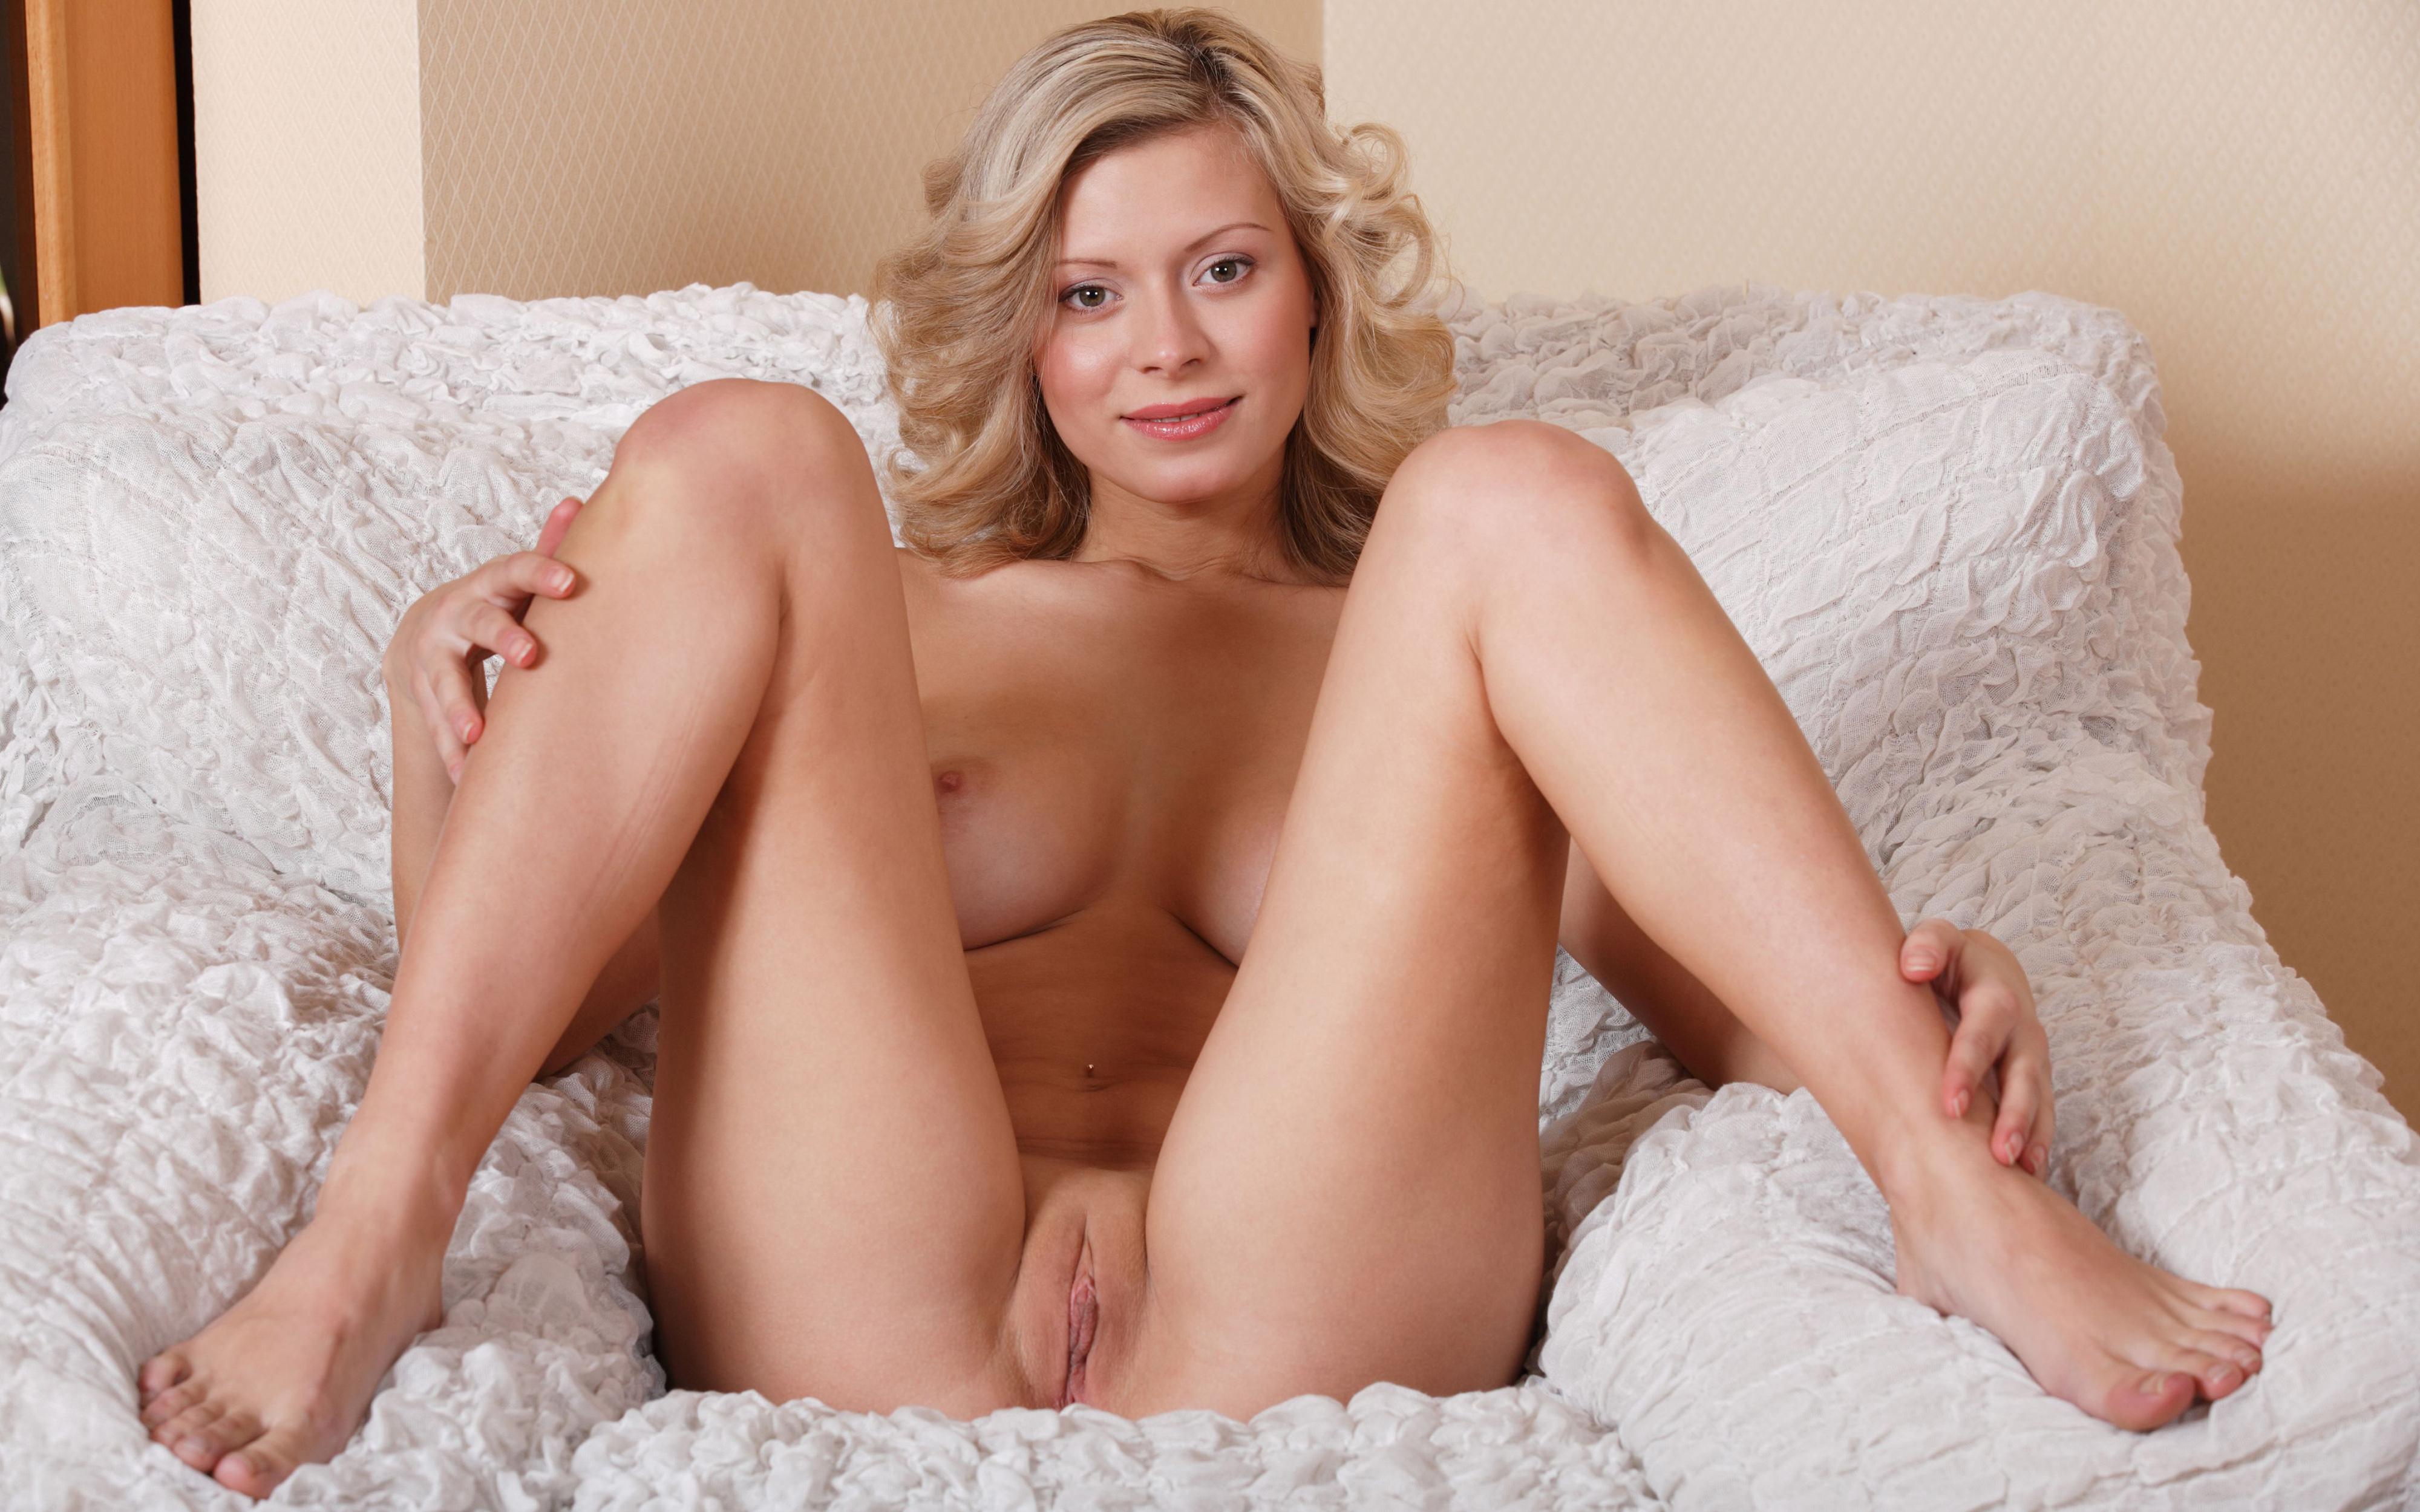 Hot horny naked woman